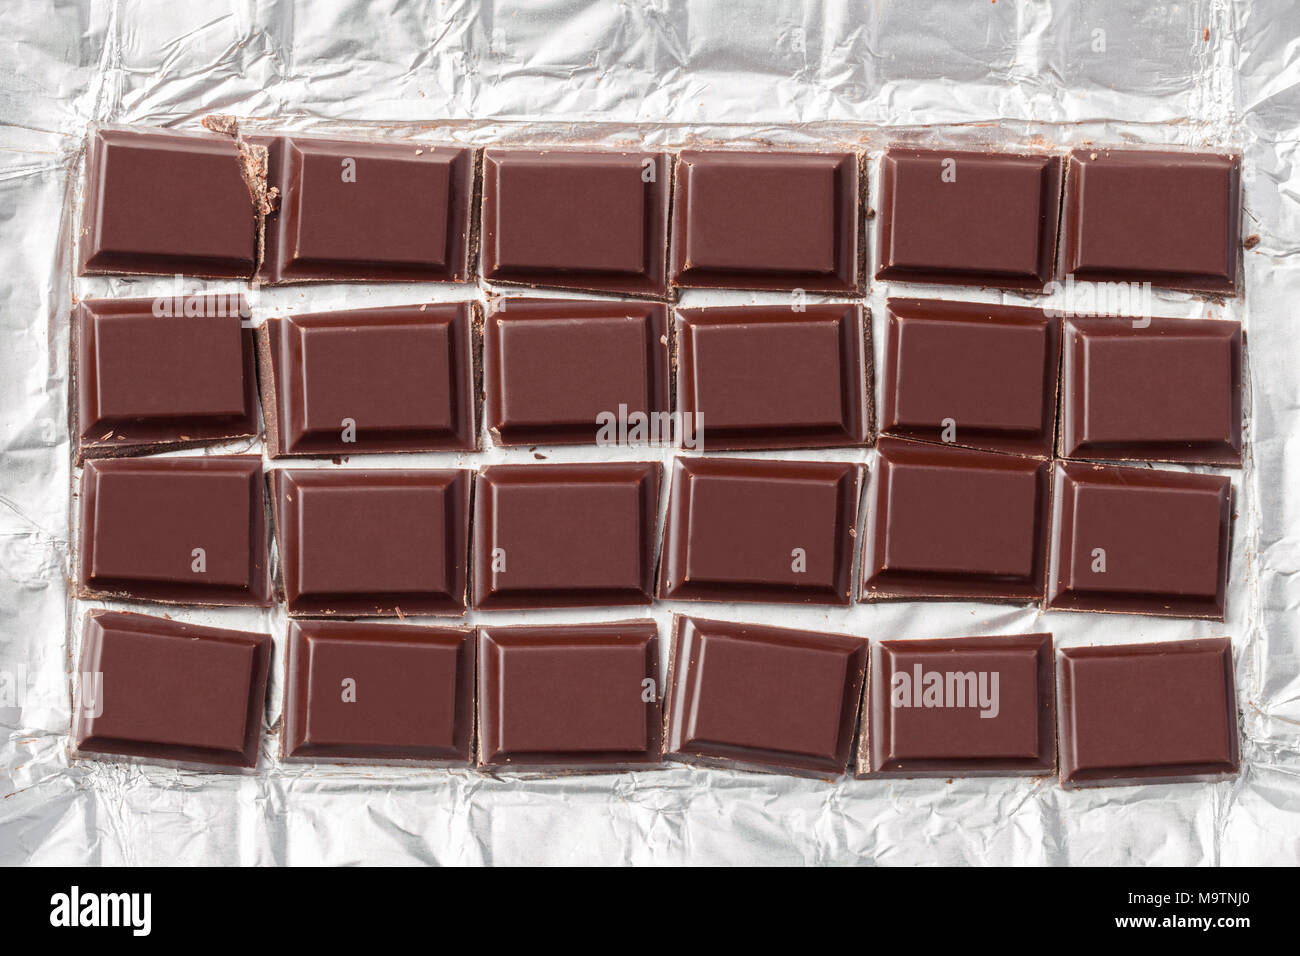 Chocolate Packaging Imágenes De Stock & Chocolate Packaging Fotos De ...